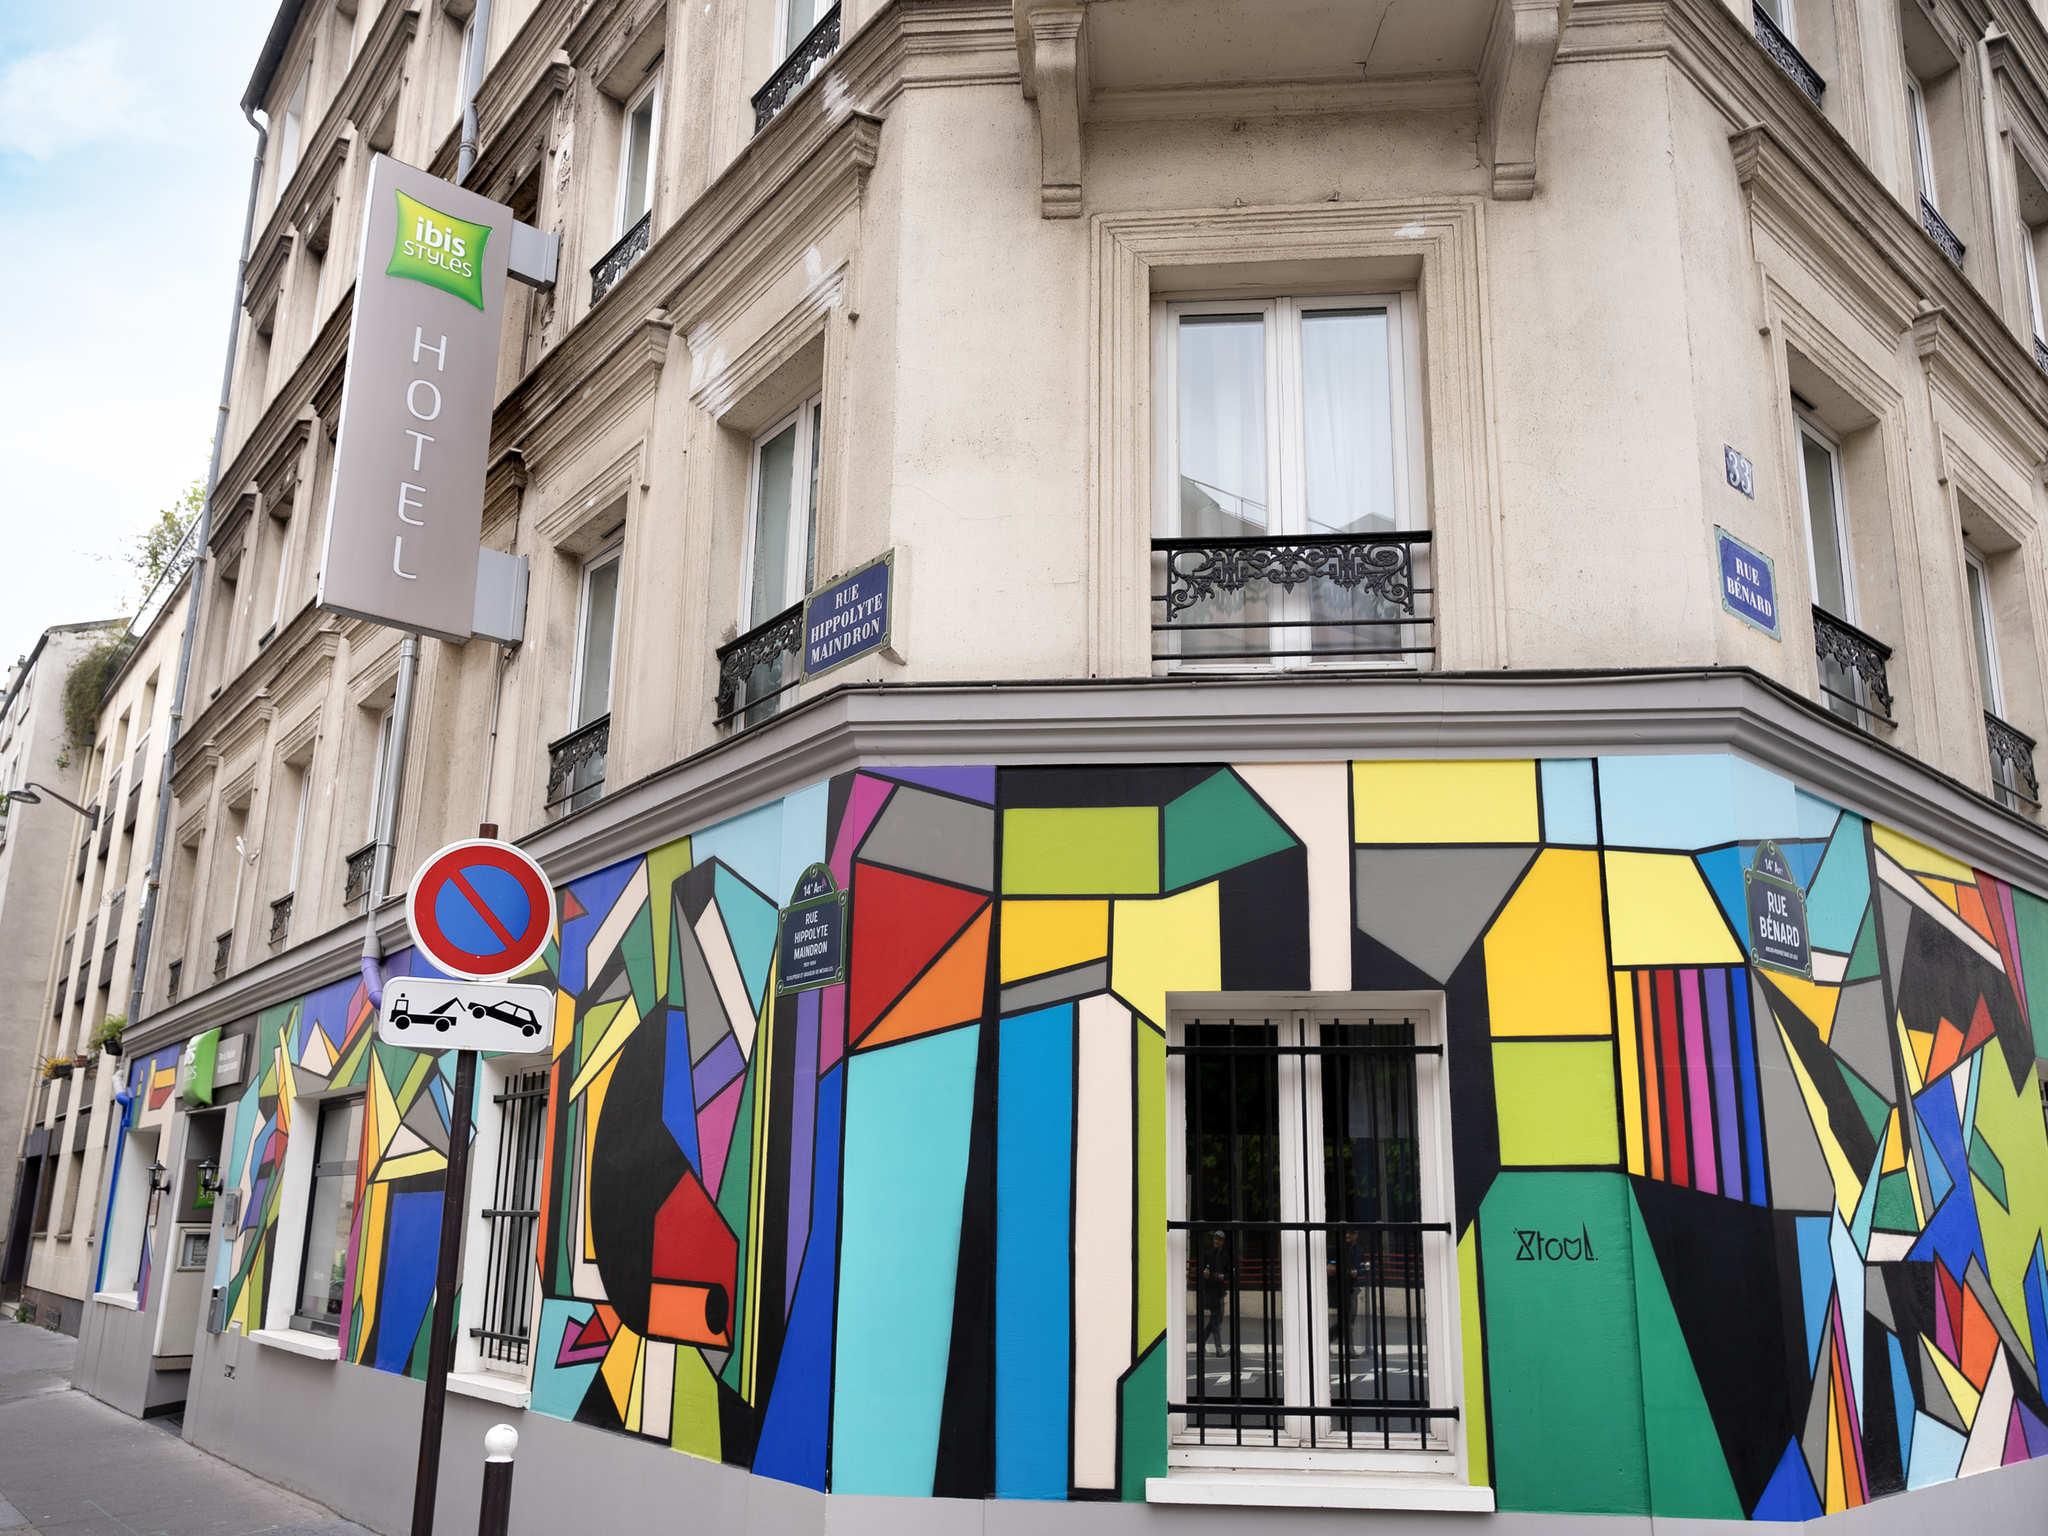 فندق - إيبيس ستايلز ibis STYLES باريس مين مونبارناس